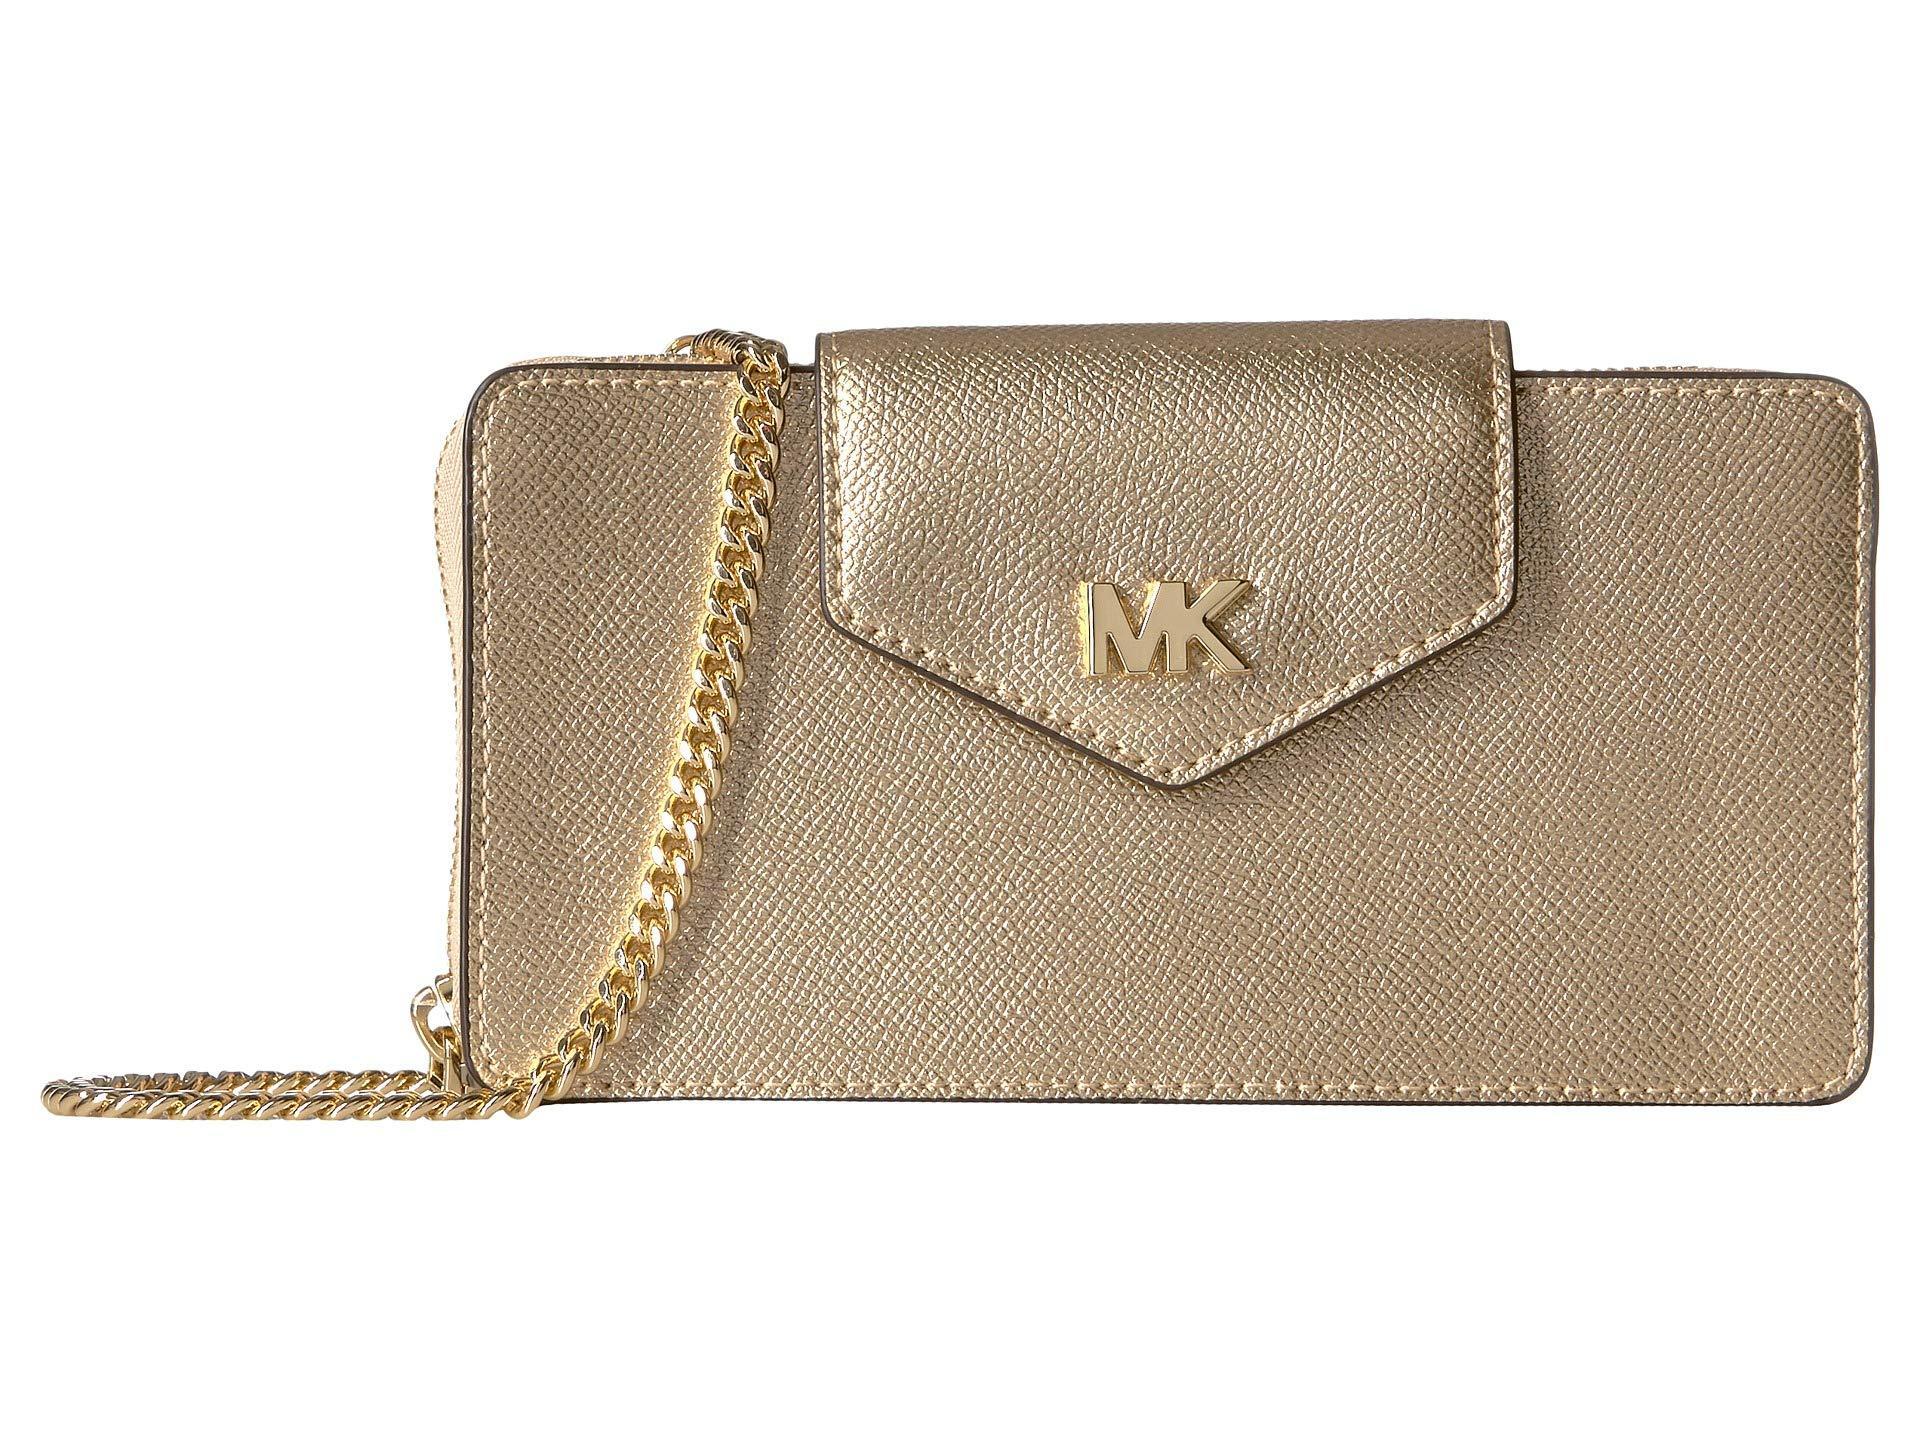 c5a9c2bcbf93 MICHAEL Michael Kors. Women s Metallic Small Convertible Phone Crossbody  (soft Pink) Handbags